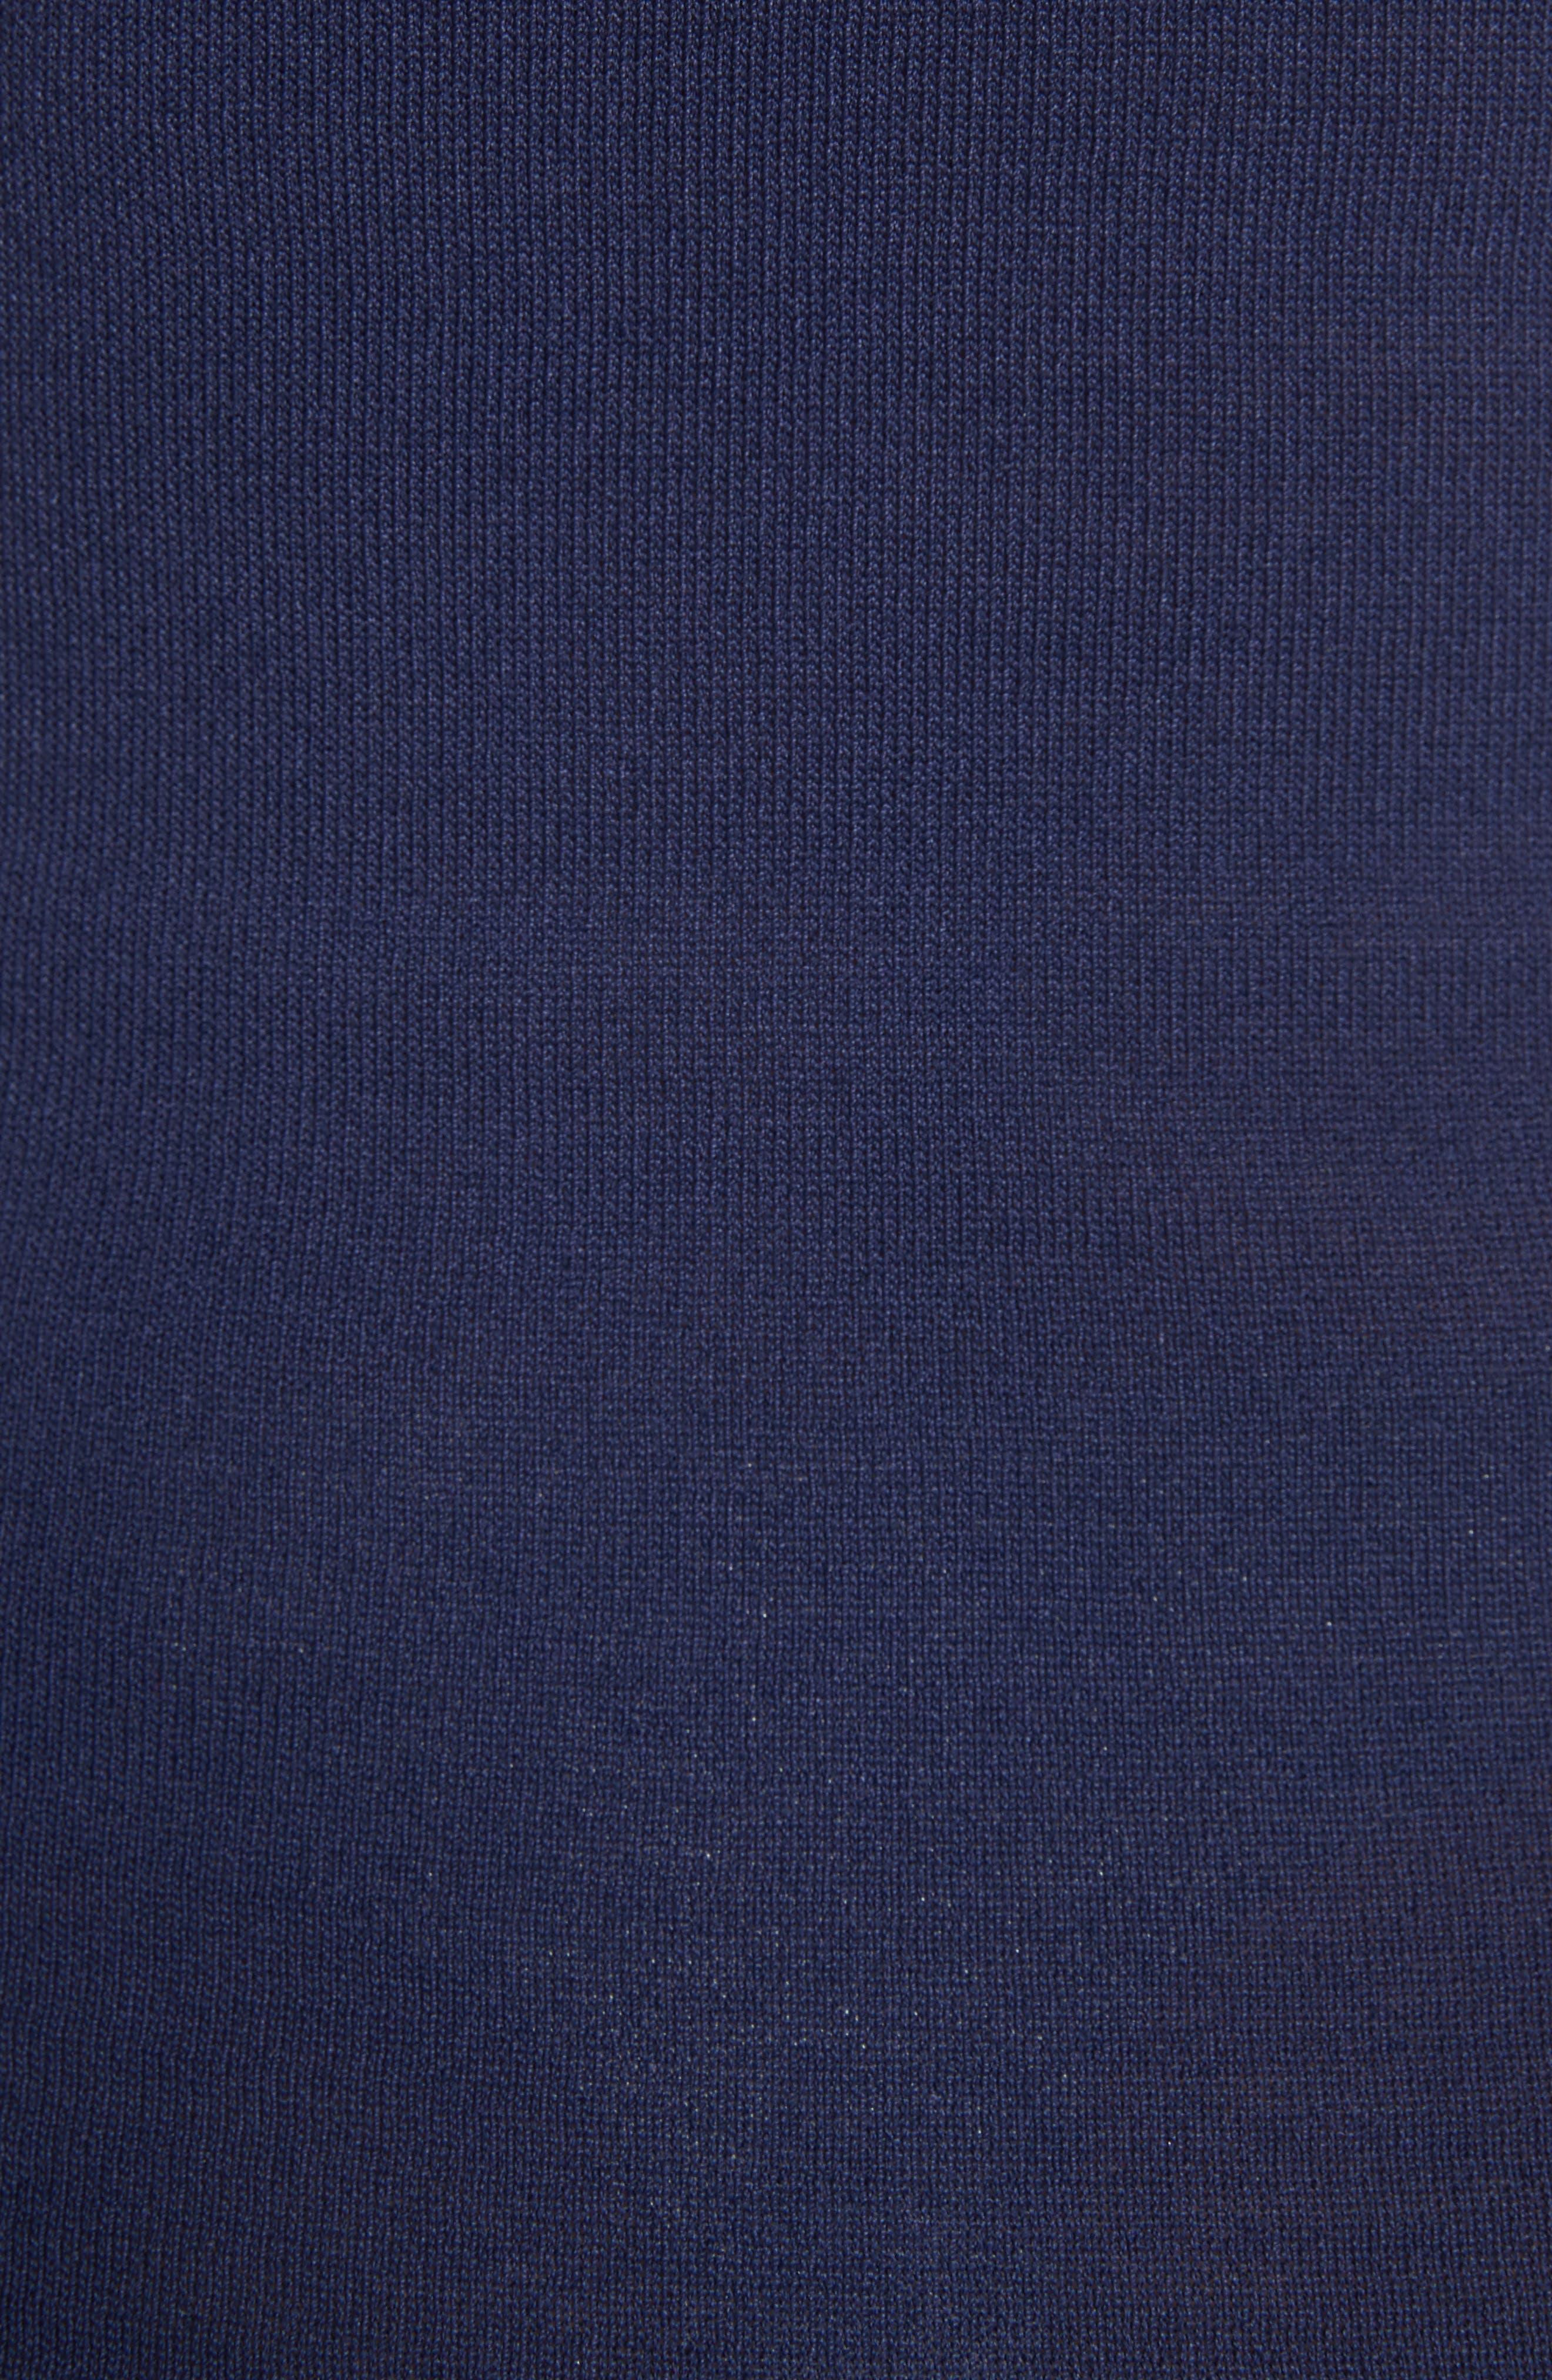 Chevron Knit Dress,                             Alternate thumbnail 5, color,                             Navy